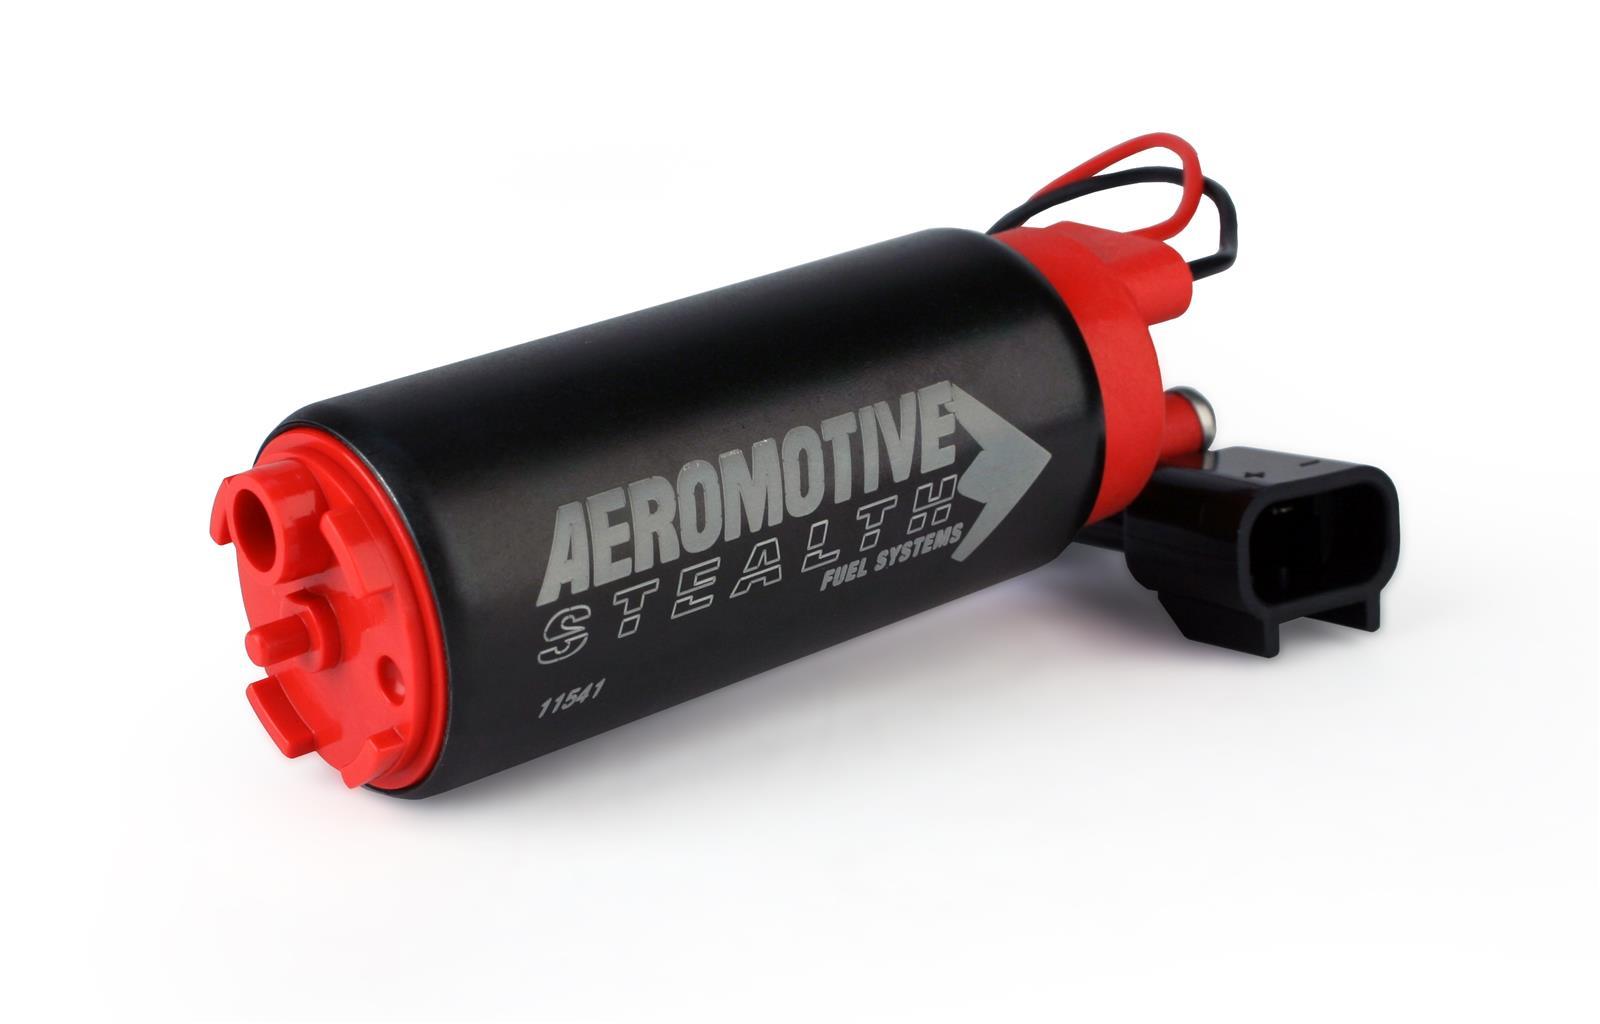 Aeromotive 11541 Stealth 340lph Electric Fuel Pump Corner3 Motorsports Filter